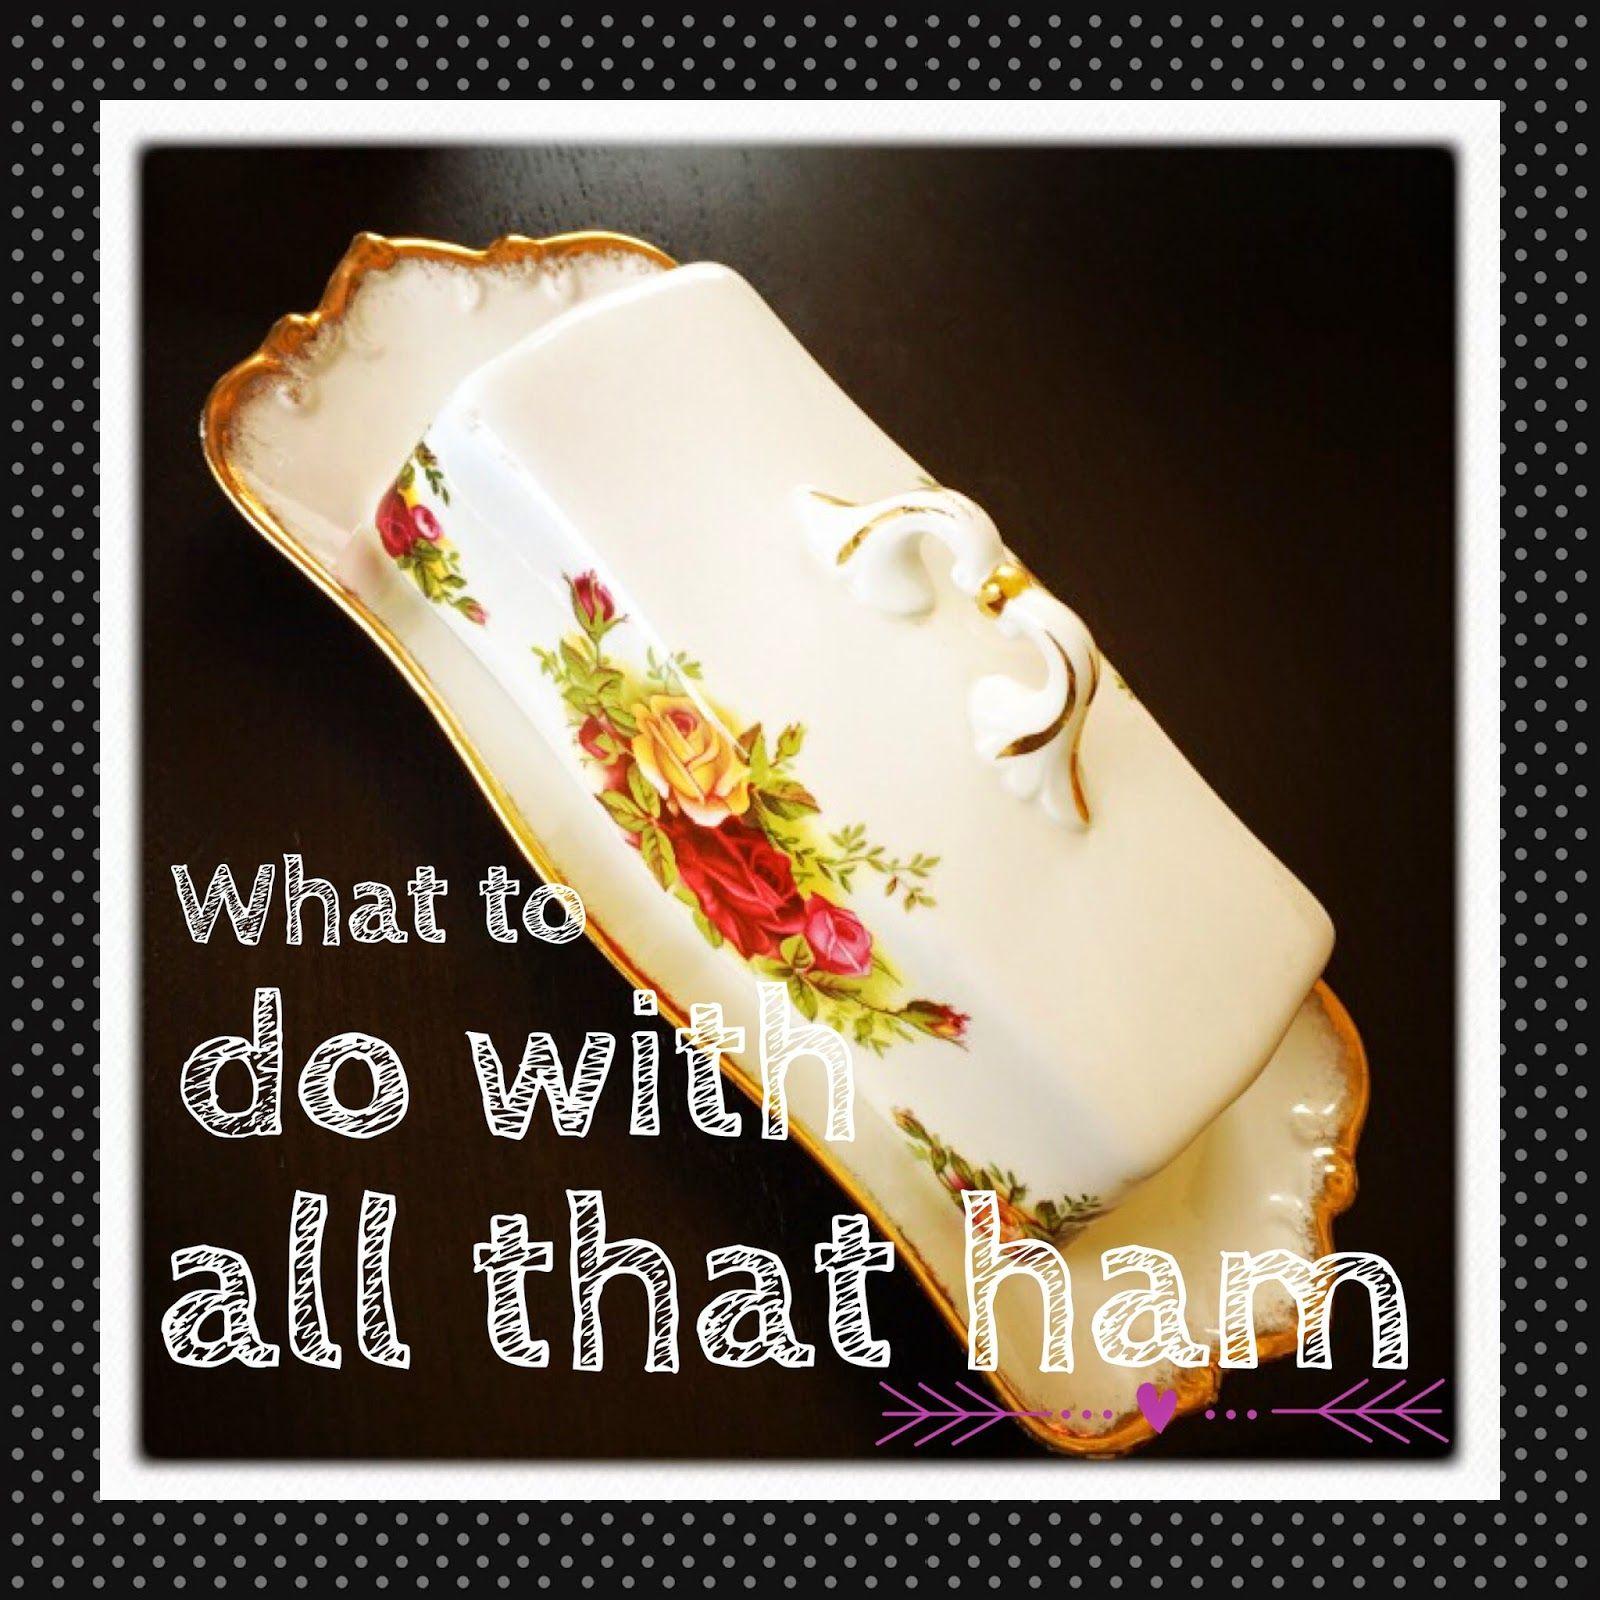 Delicious Easy Easter Ham Leftover Ideas, The Graffitied Gardenia blog